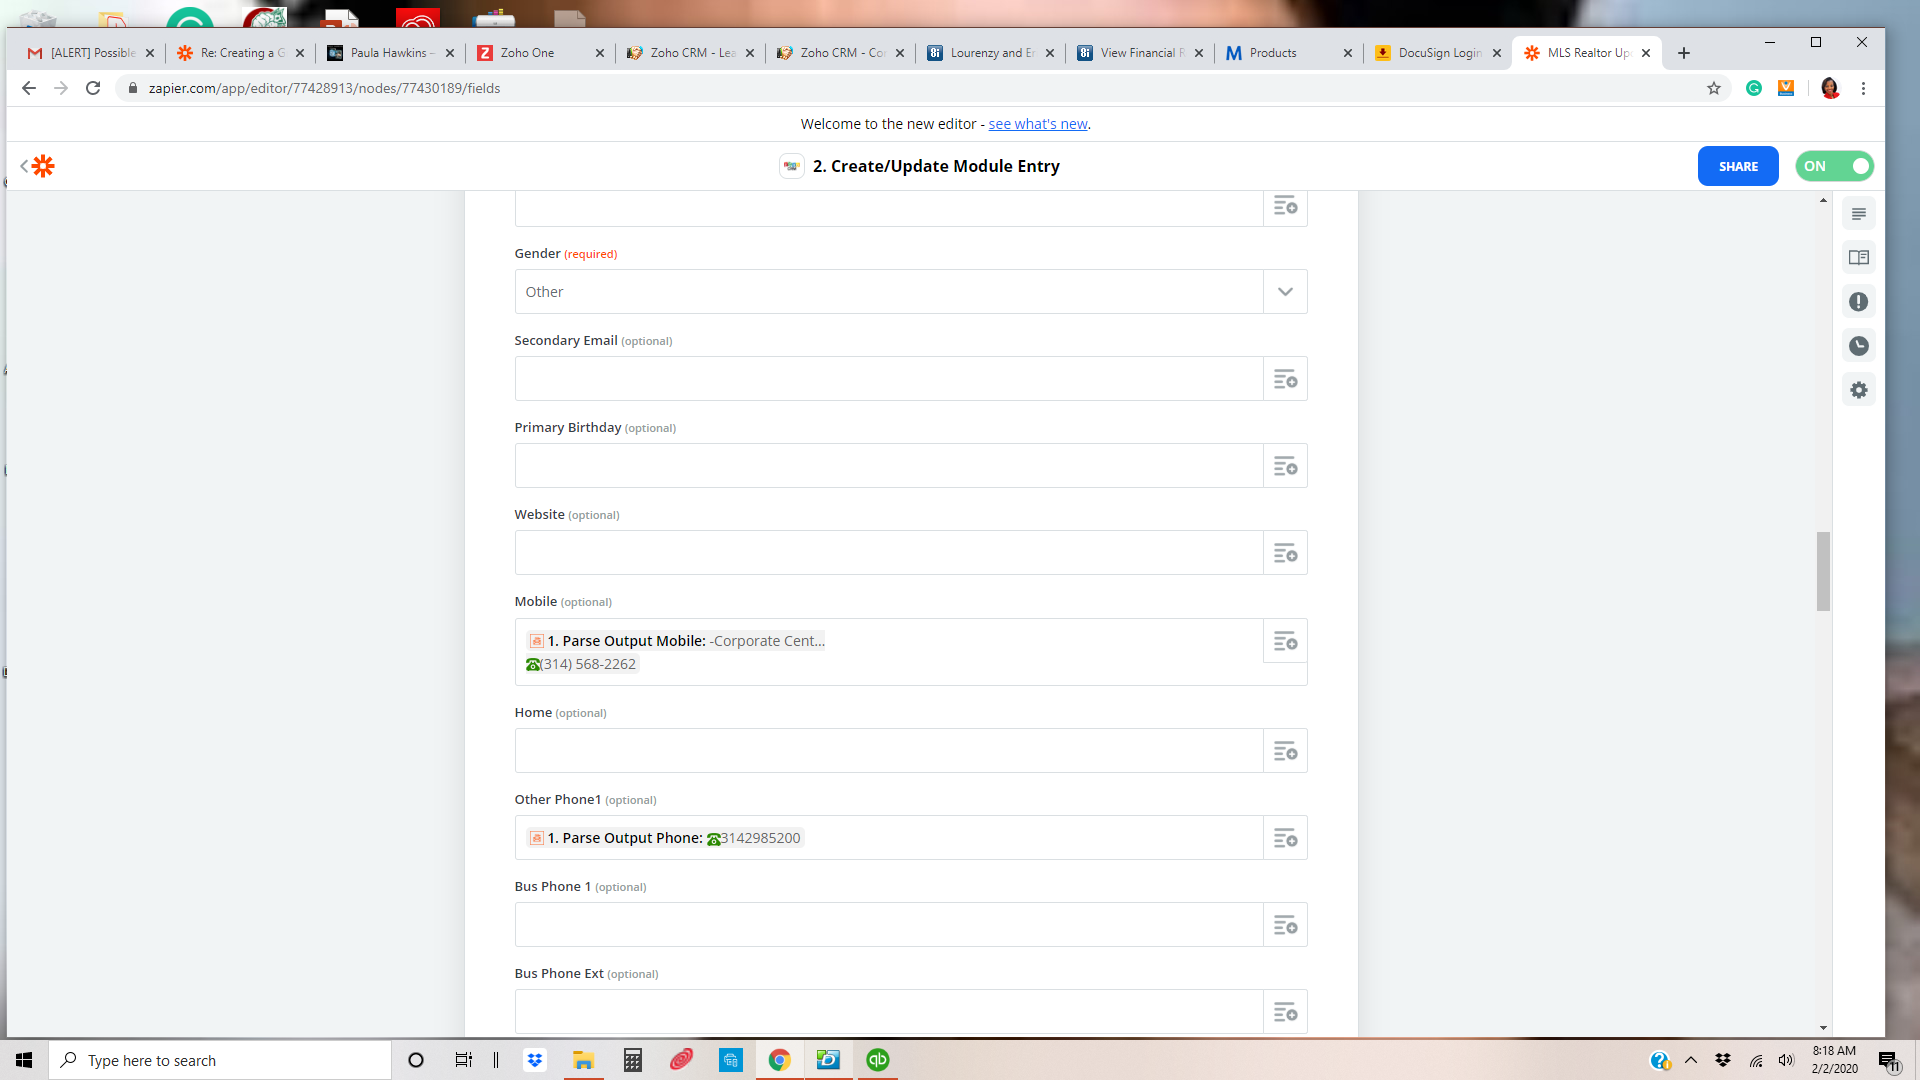 Screenshot 2020-02-02 08.18.30.png